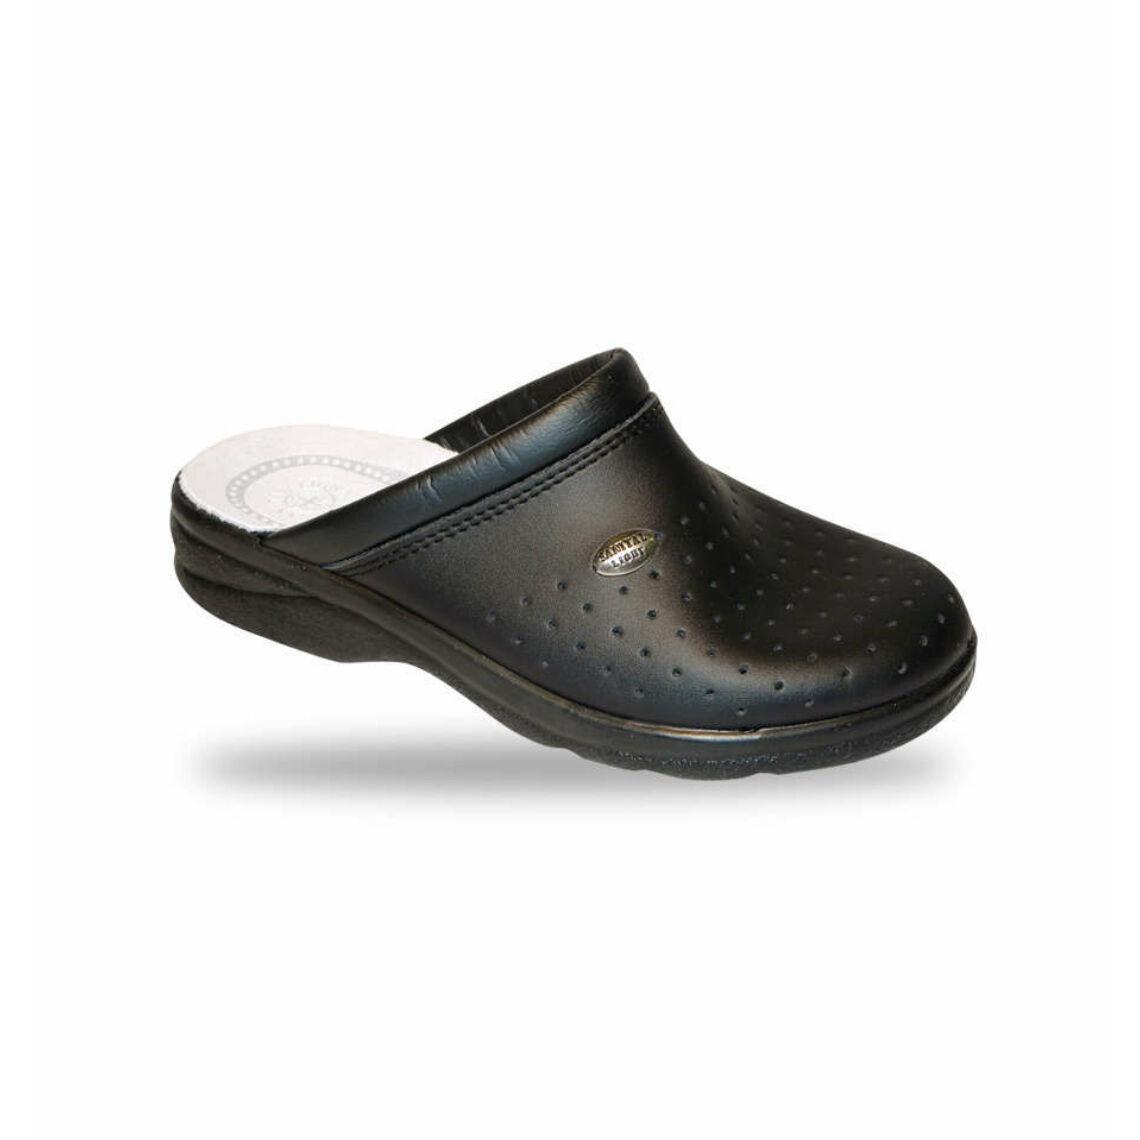 bbf4d30ee7 Drmontebosco Férfi Papucs - Klumpa - BIO PAPUCSOK - Női cipő ...